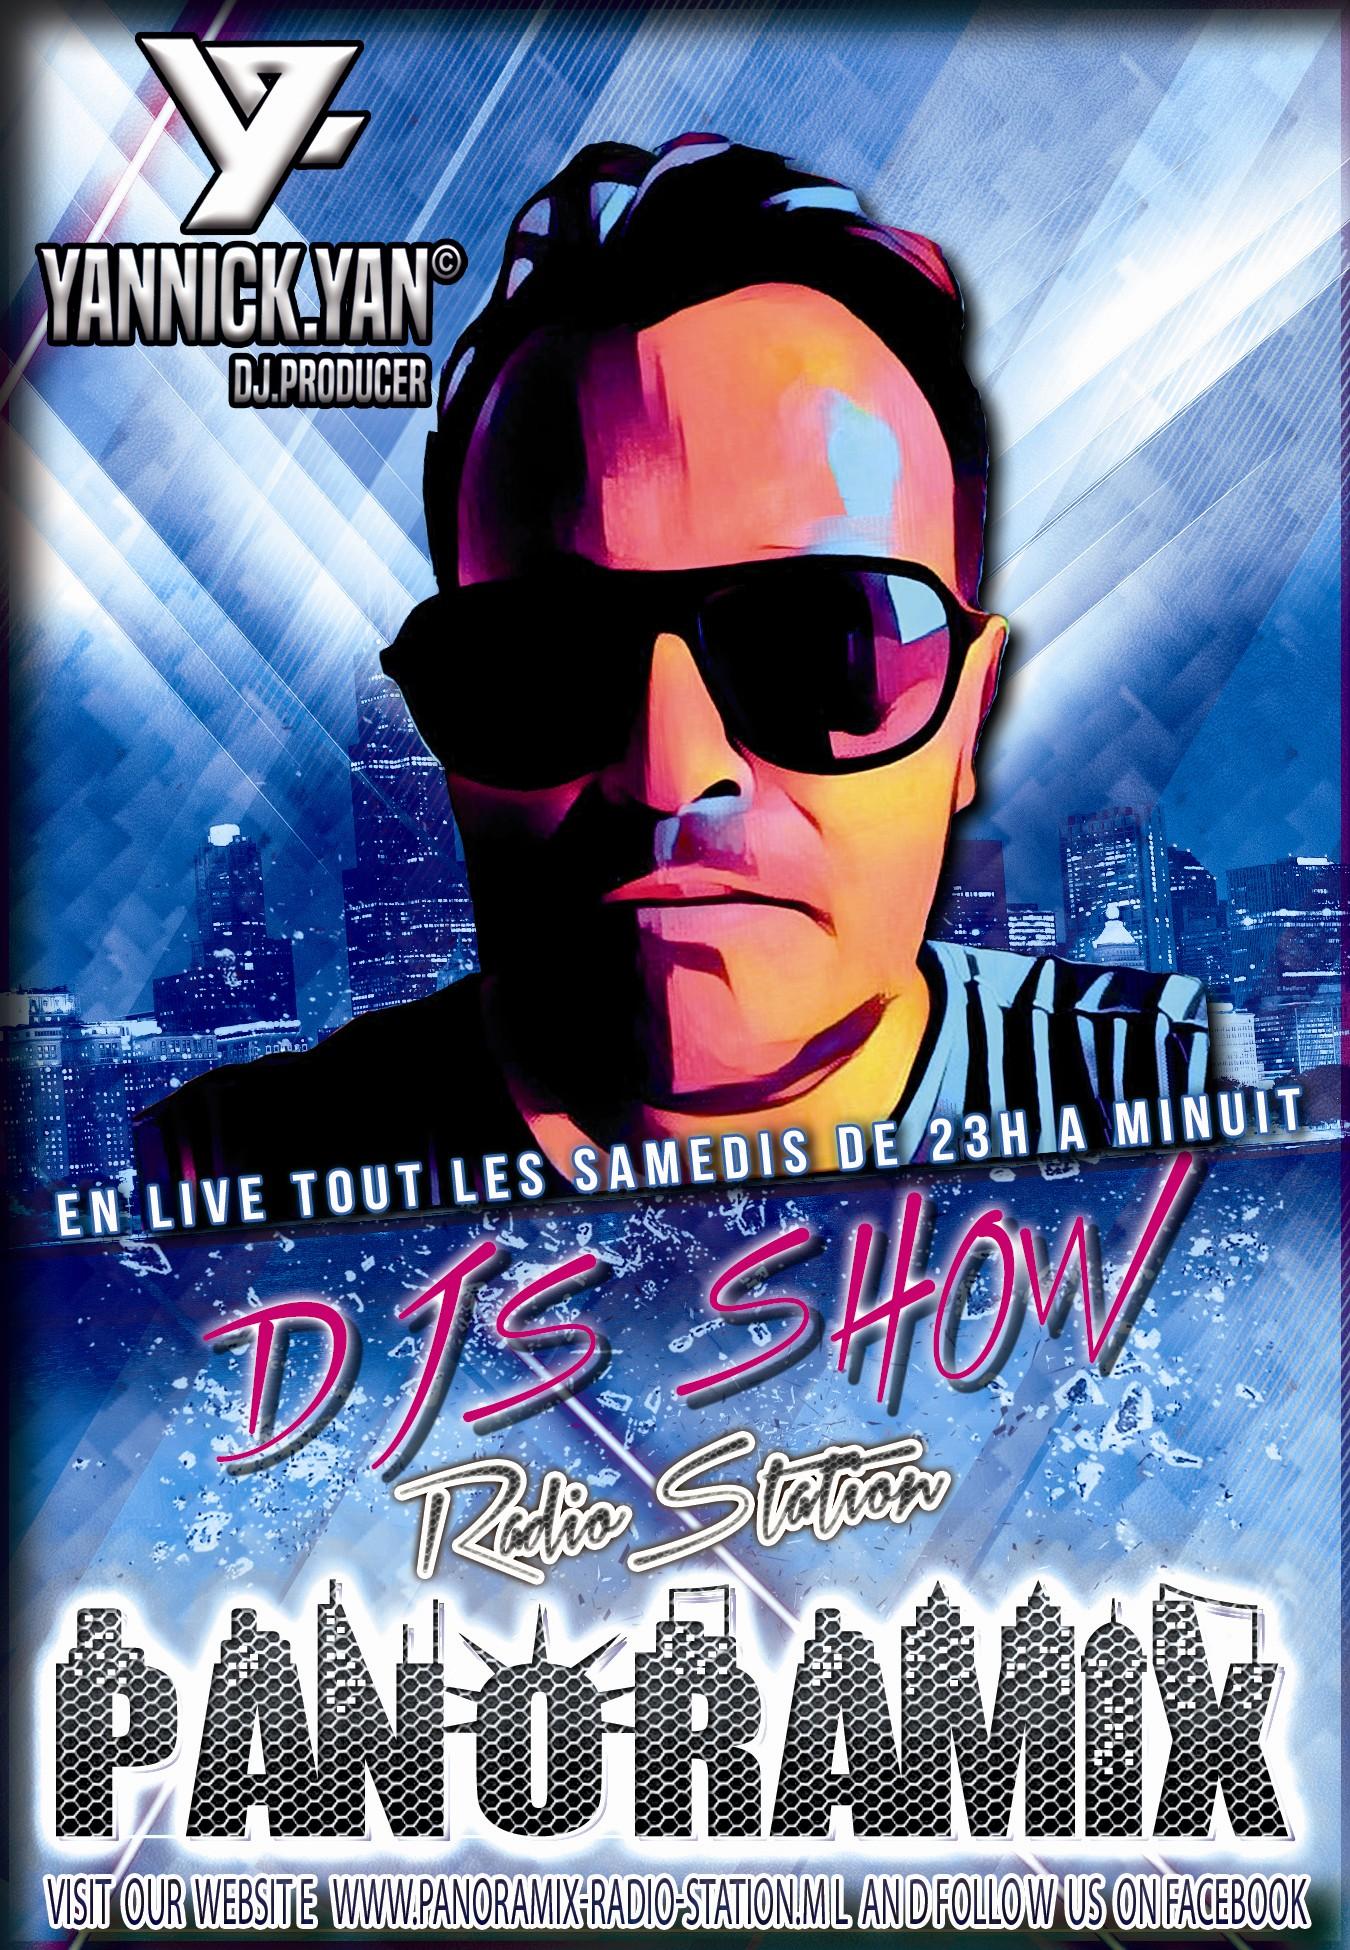 http://panoramix-radio-station.com/wp-content/uploads/2016/12/YANNICK-YAN-DJ-SHOW-PANORAMIX-AFFICHE1.jpg